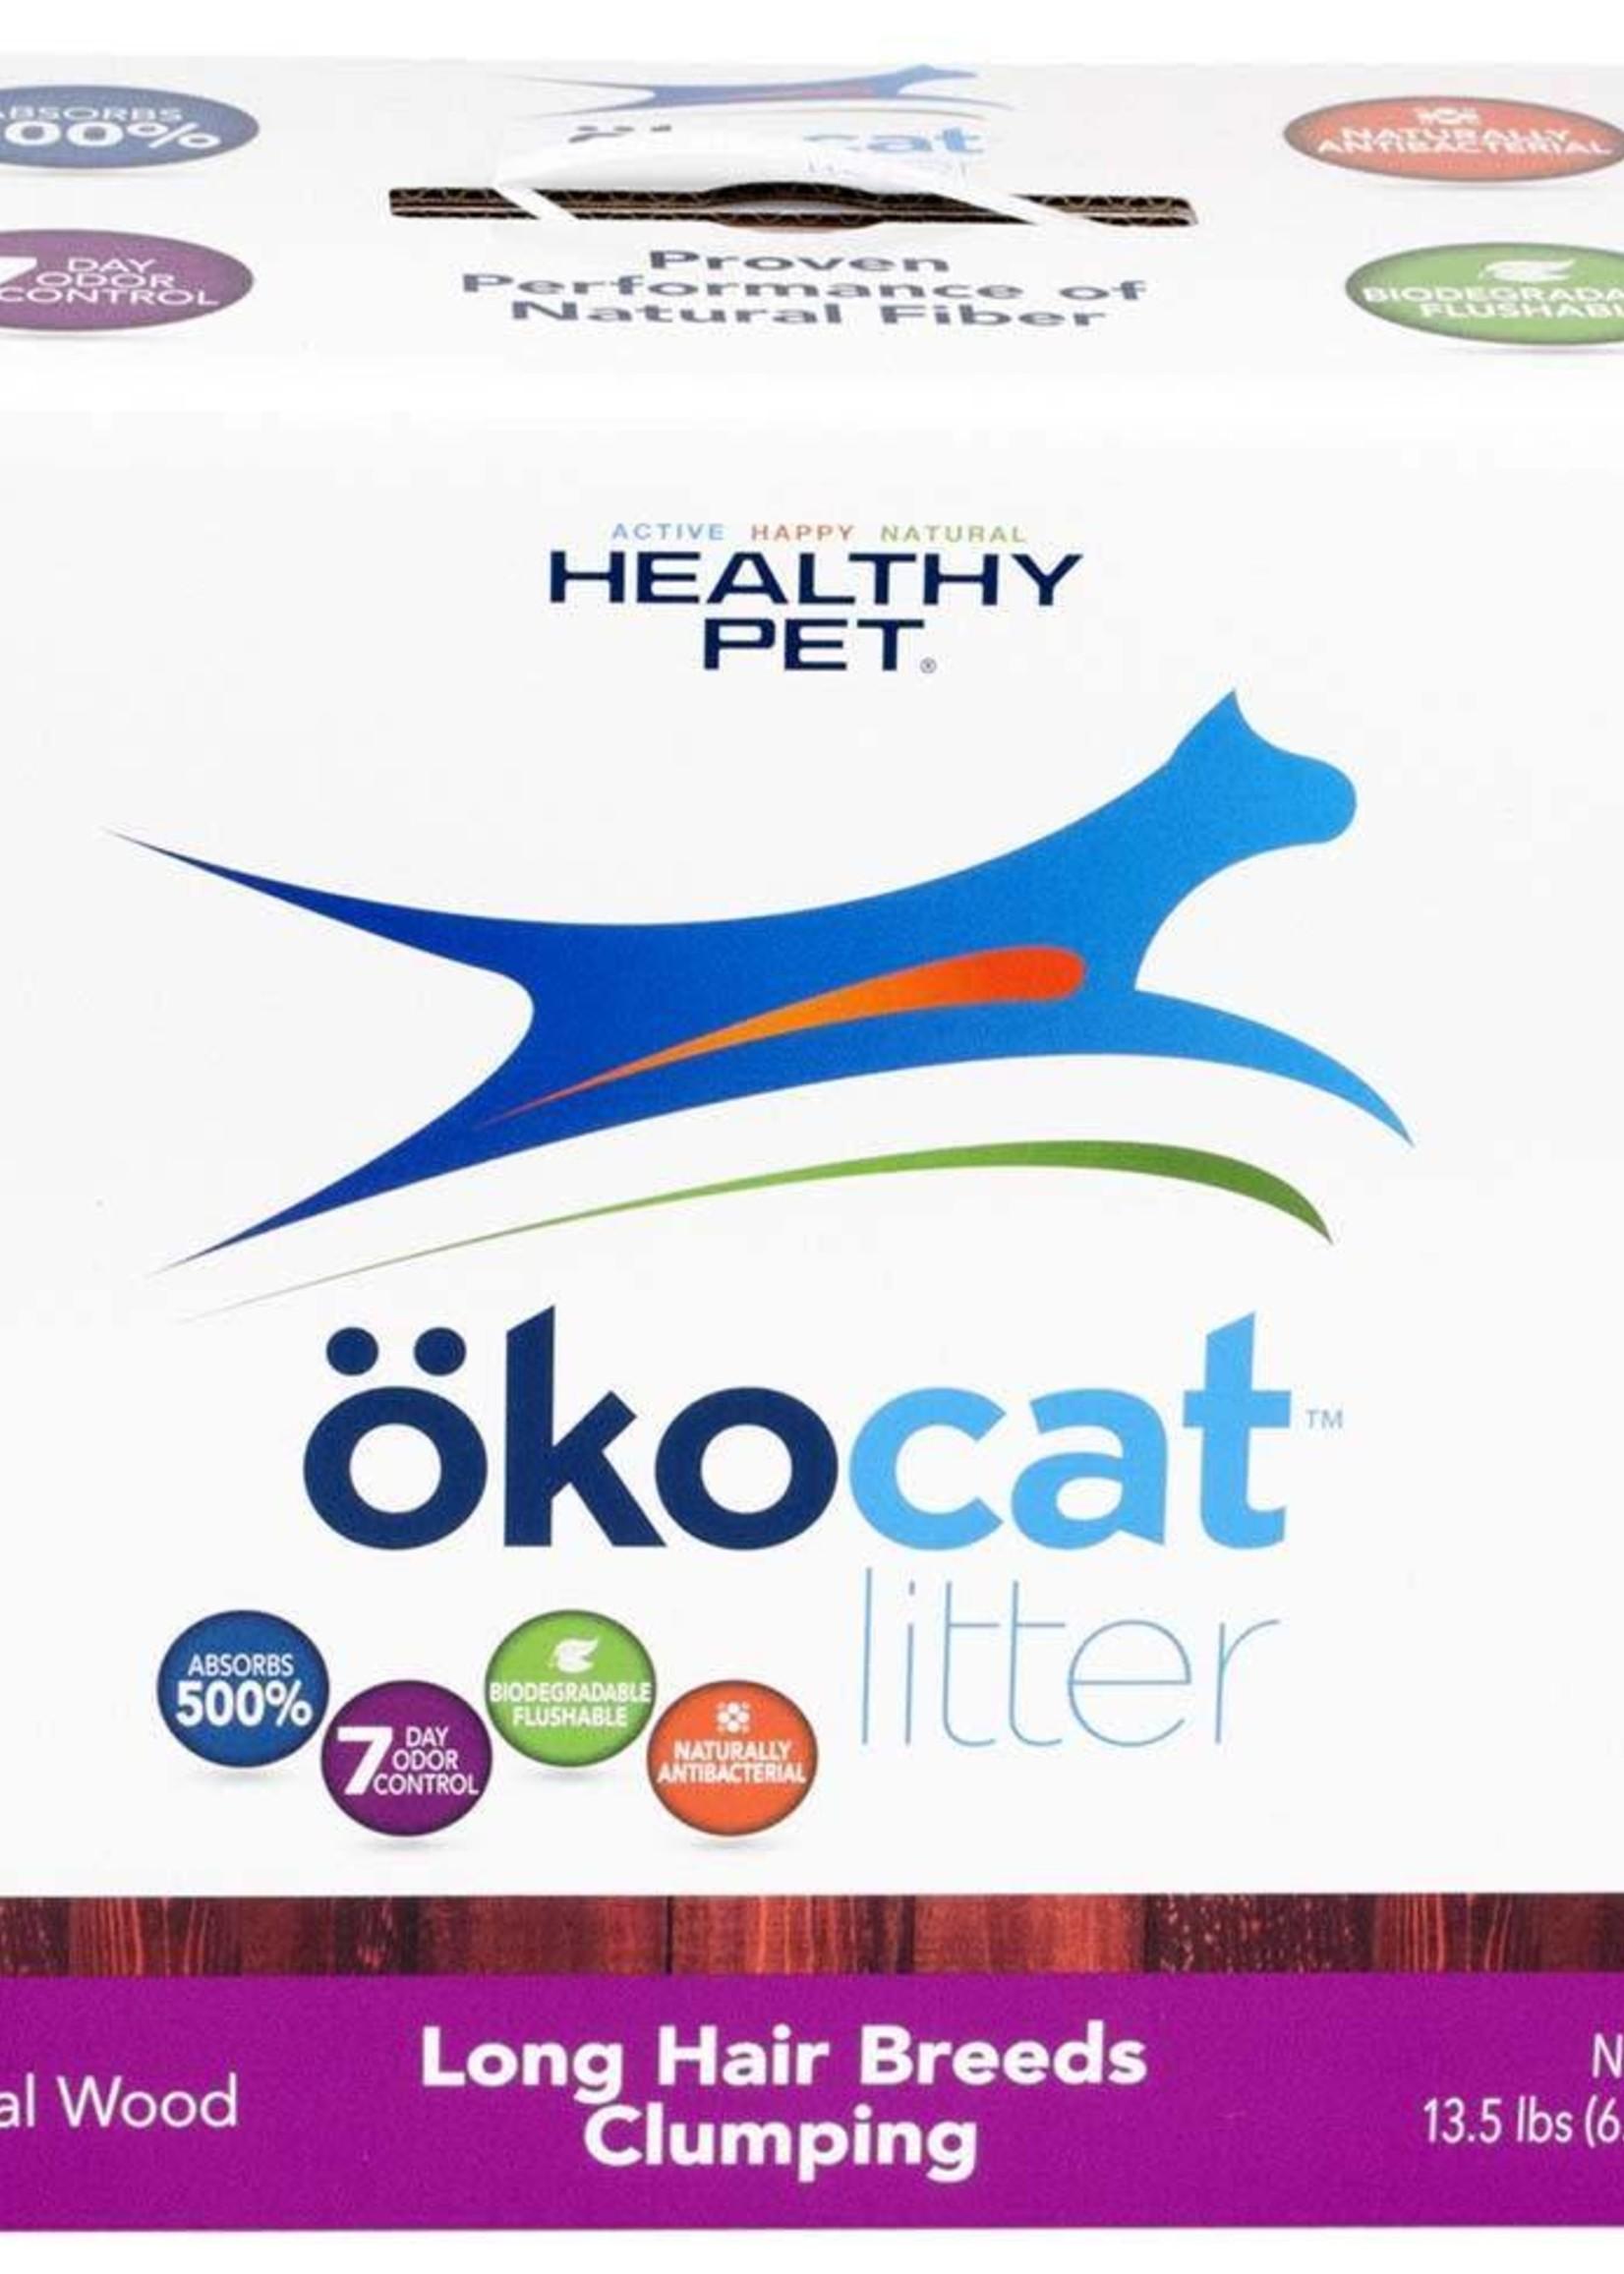 HEALTHY PET Okocat PURPLE Wood Long Hair Breeds Clumping 20#